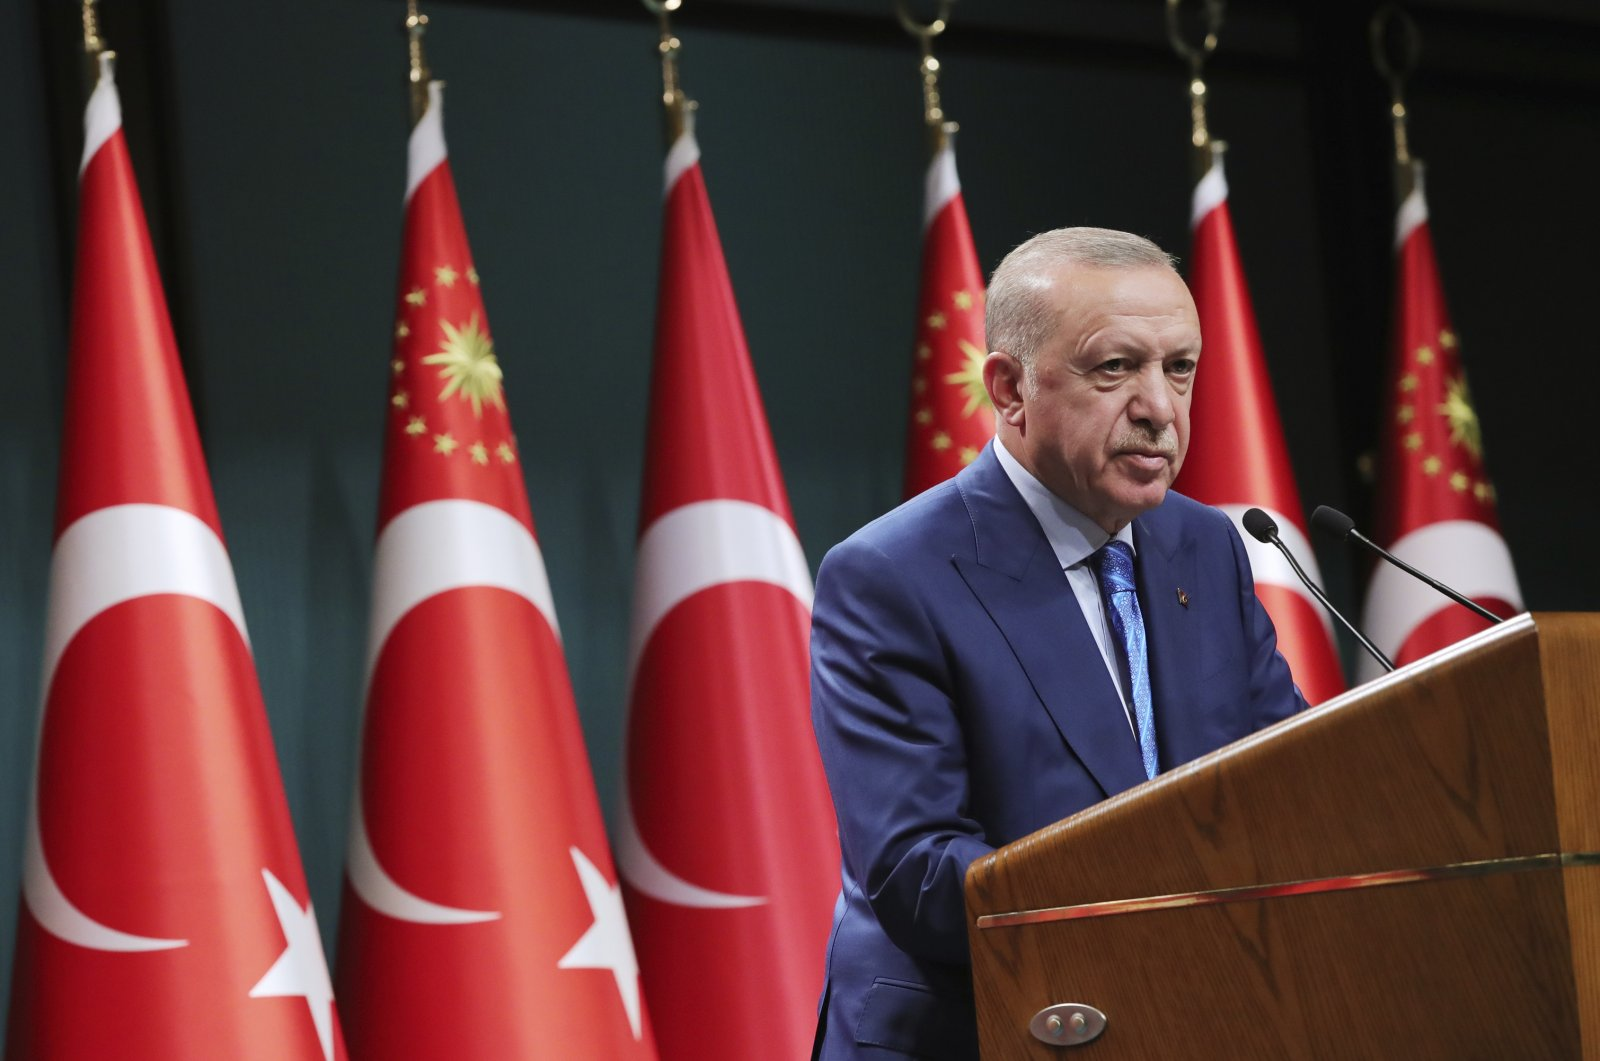 President Recep Tayyip Erdoğan speaks during a televised address following a Cabinet meeting, in Ankara, Turkey, Aug. 19, 2021. (Turkish Presidency via AP)